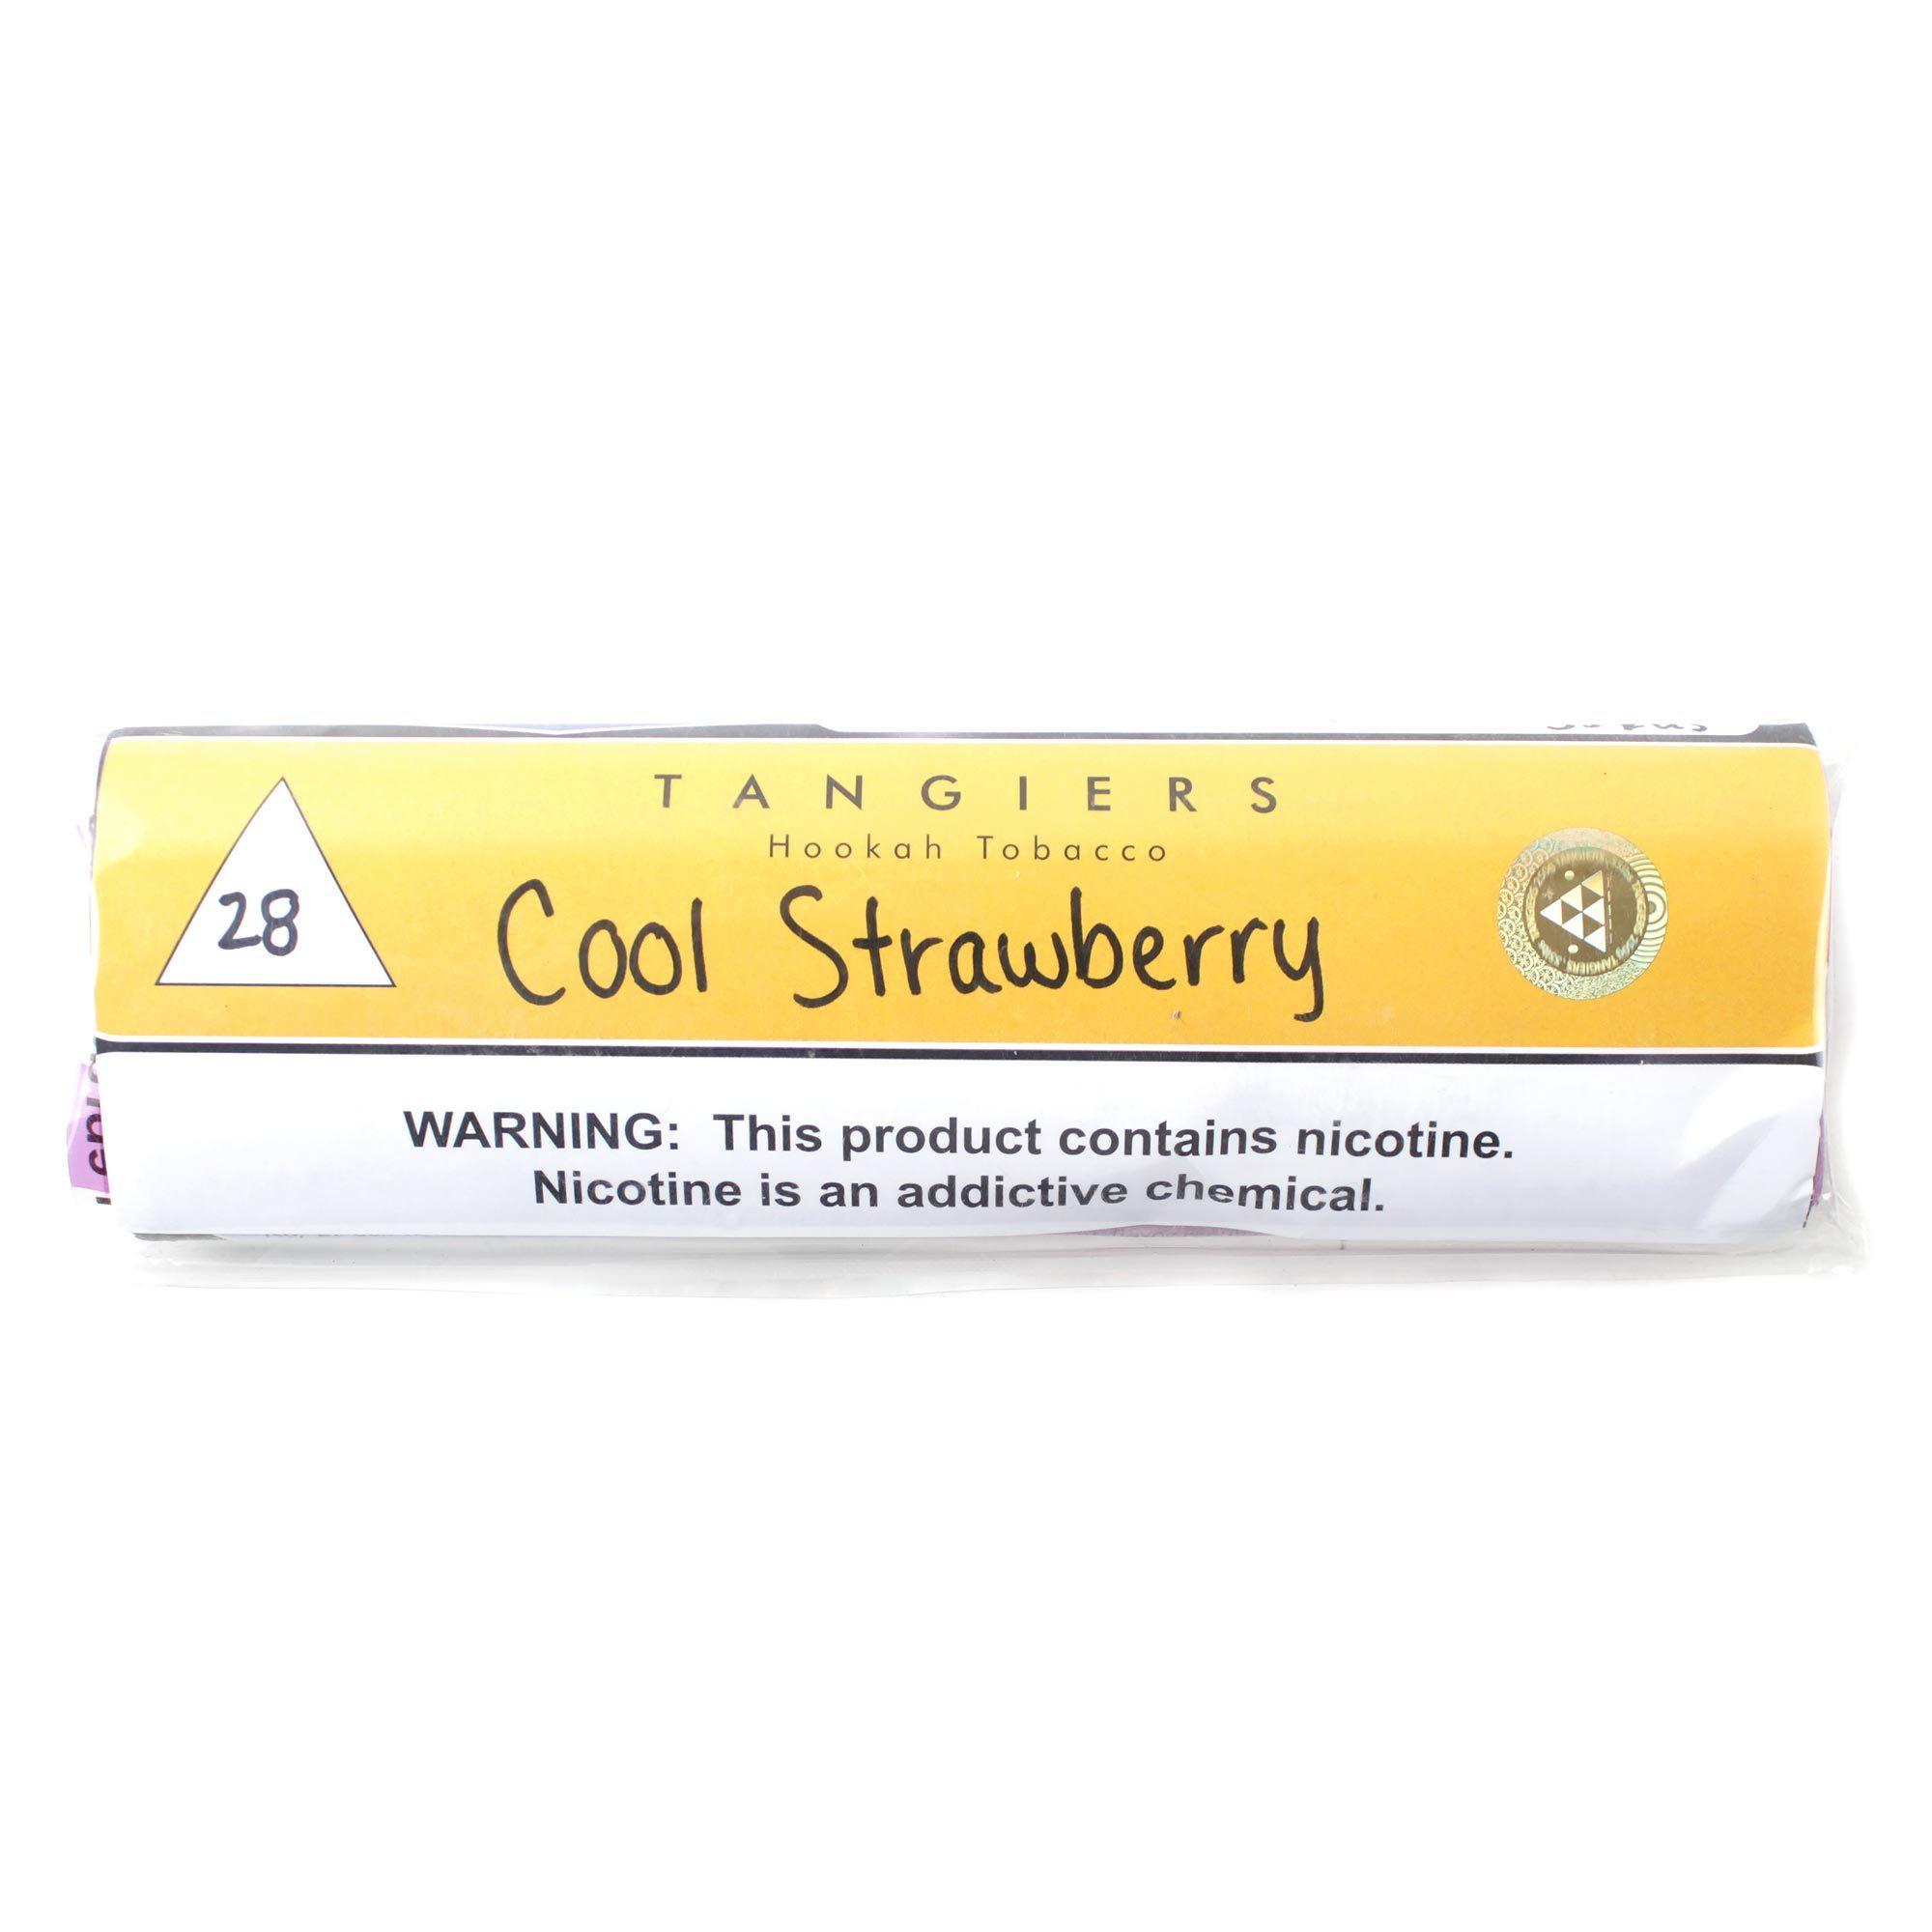 Табак для кальяна Tangiers Noir (желтый) 28 Cool Strawberry 250 гр